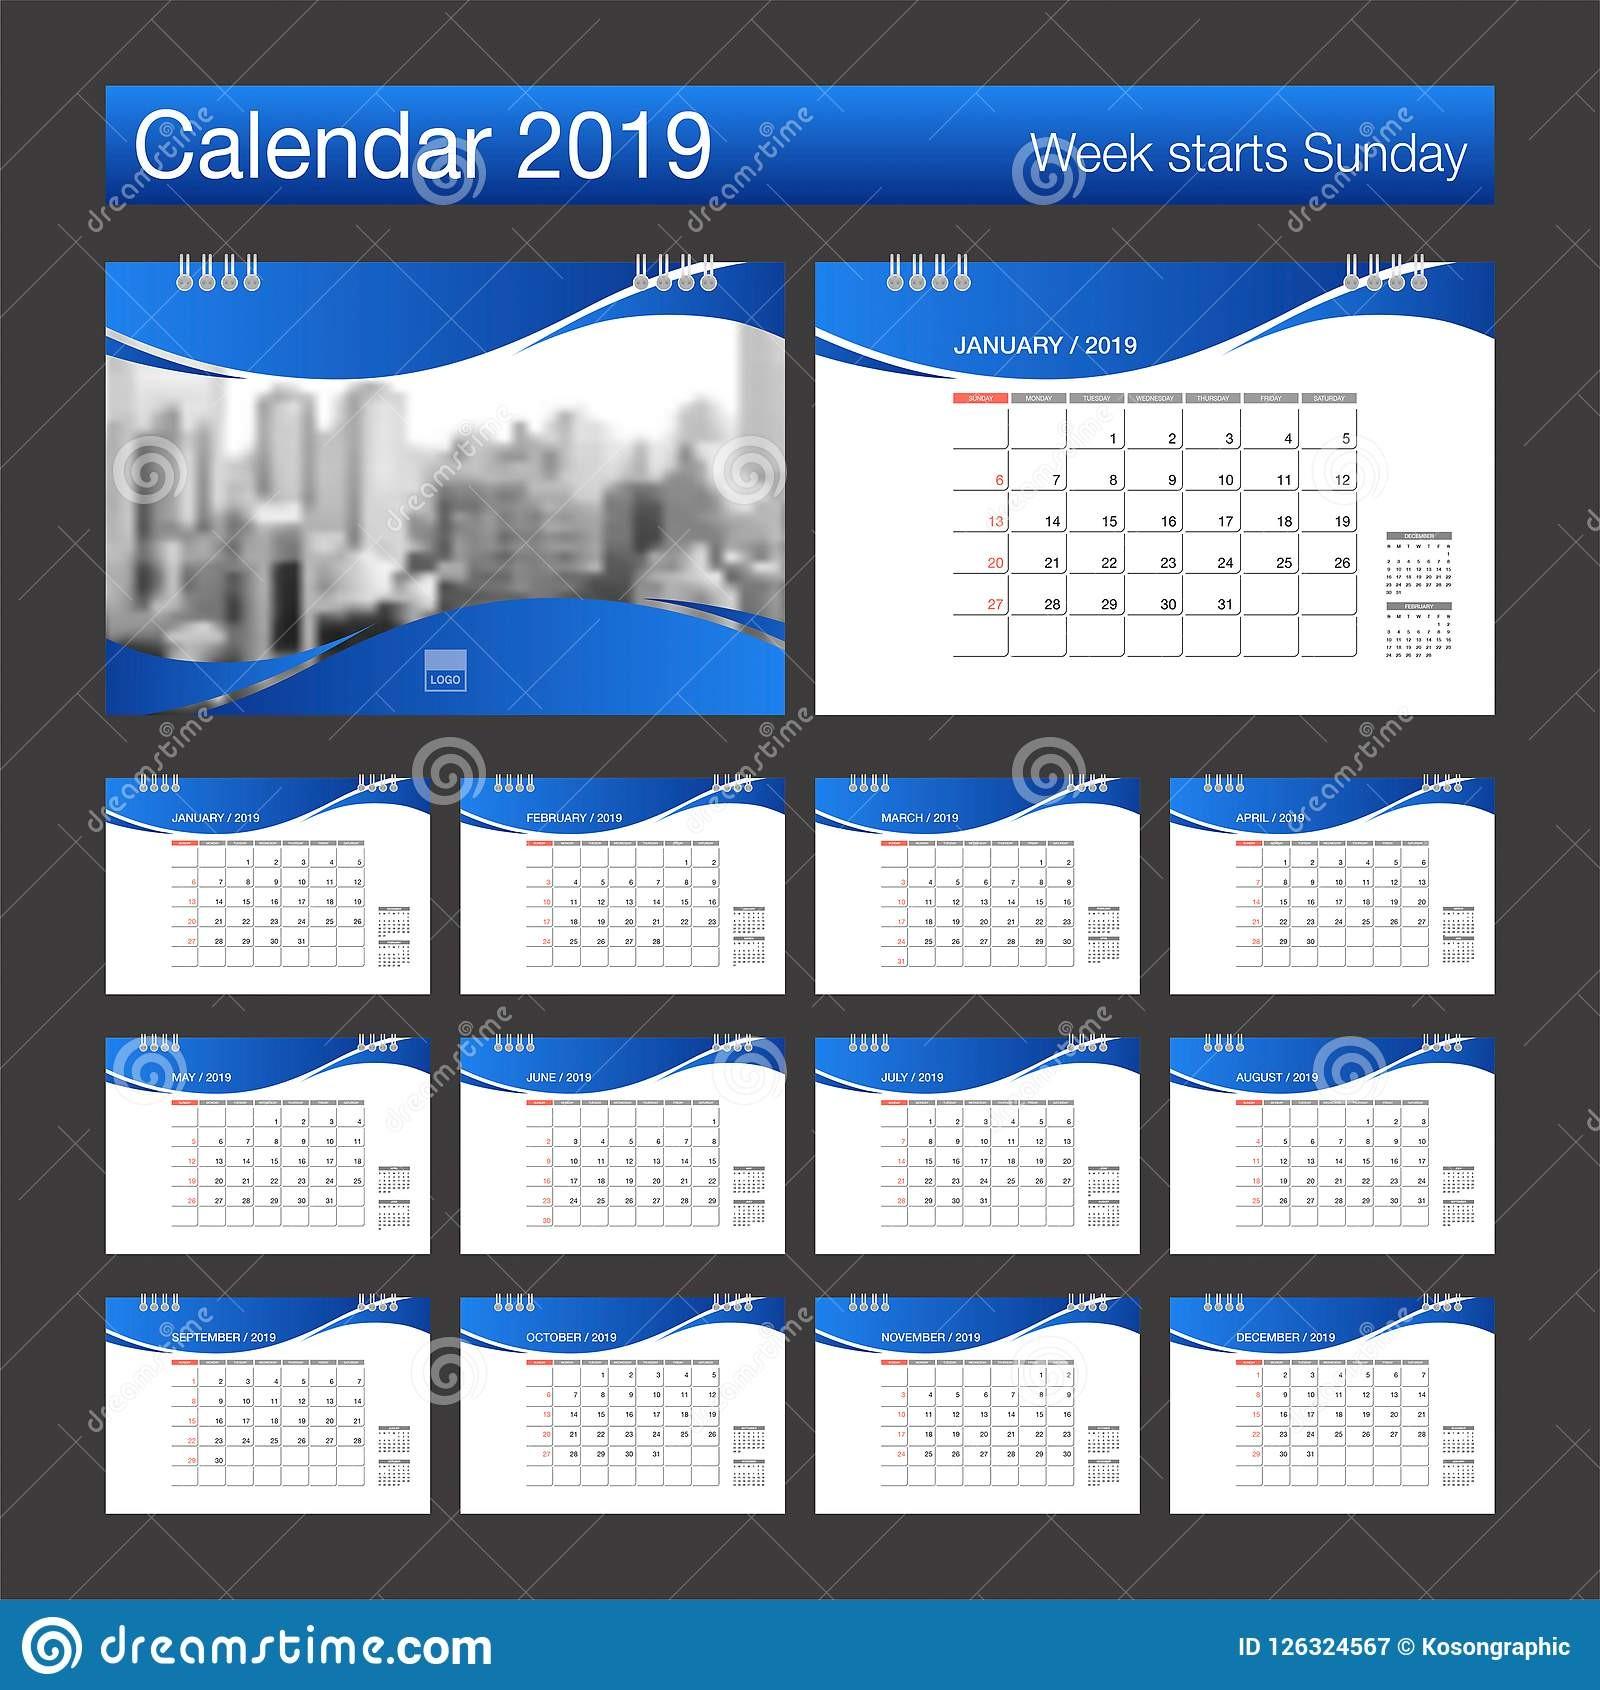 Calendario 2019 Com Feriados Espana Más Arriba-a-fecha Calendario 2019 Estilos Para Imprimir Abril T Of Calendario 2019 Com Feriados Espana Mejores Y Más Novedosos Mes De Septiembre 2017